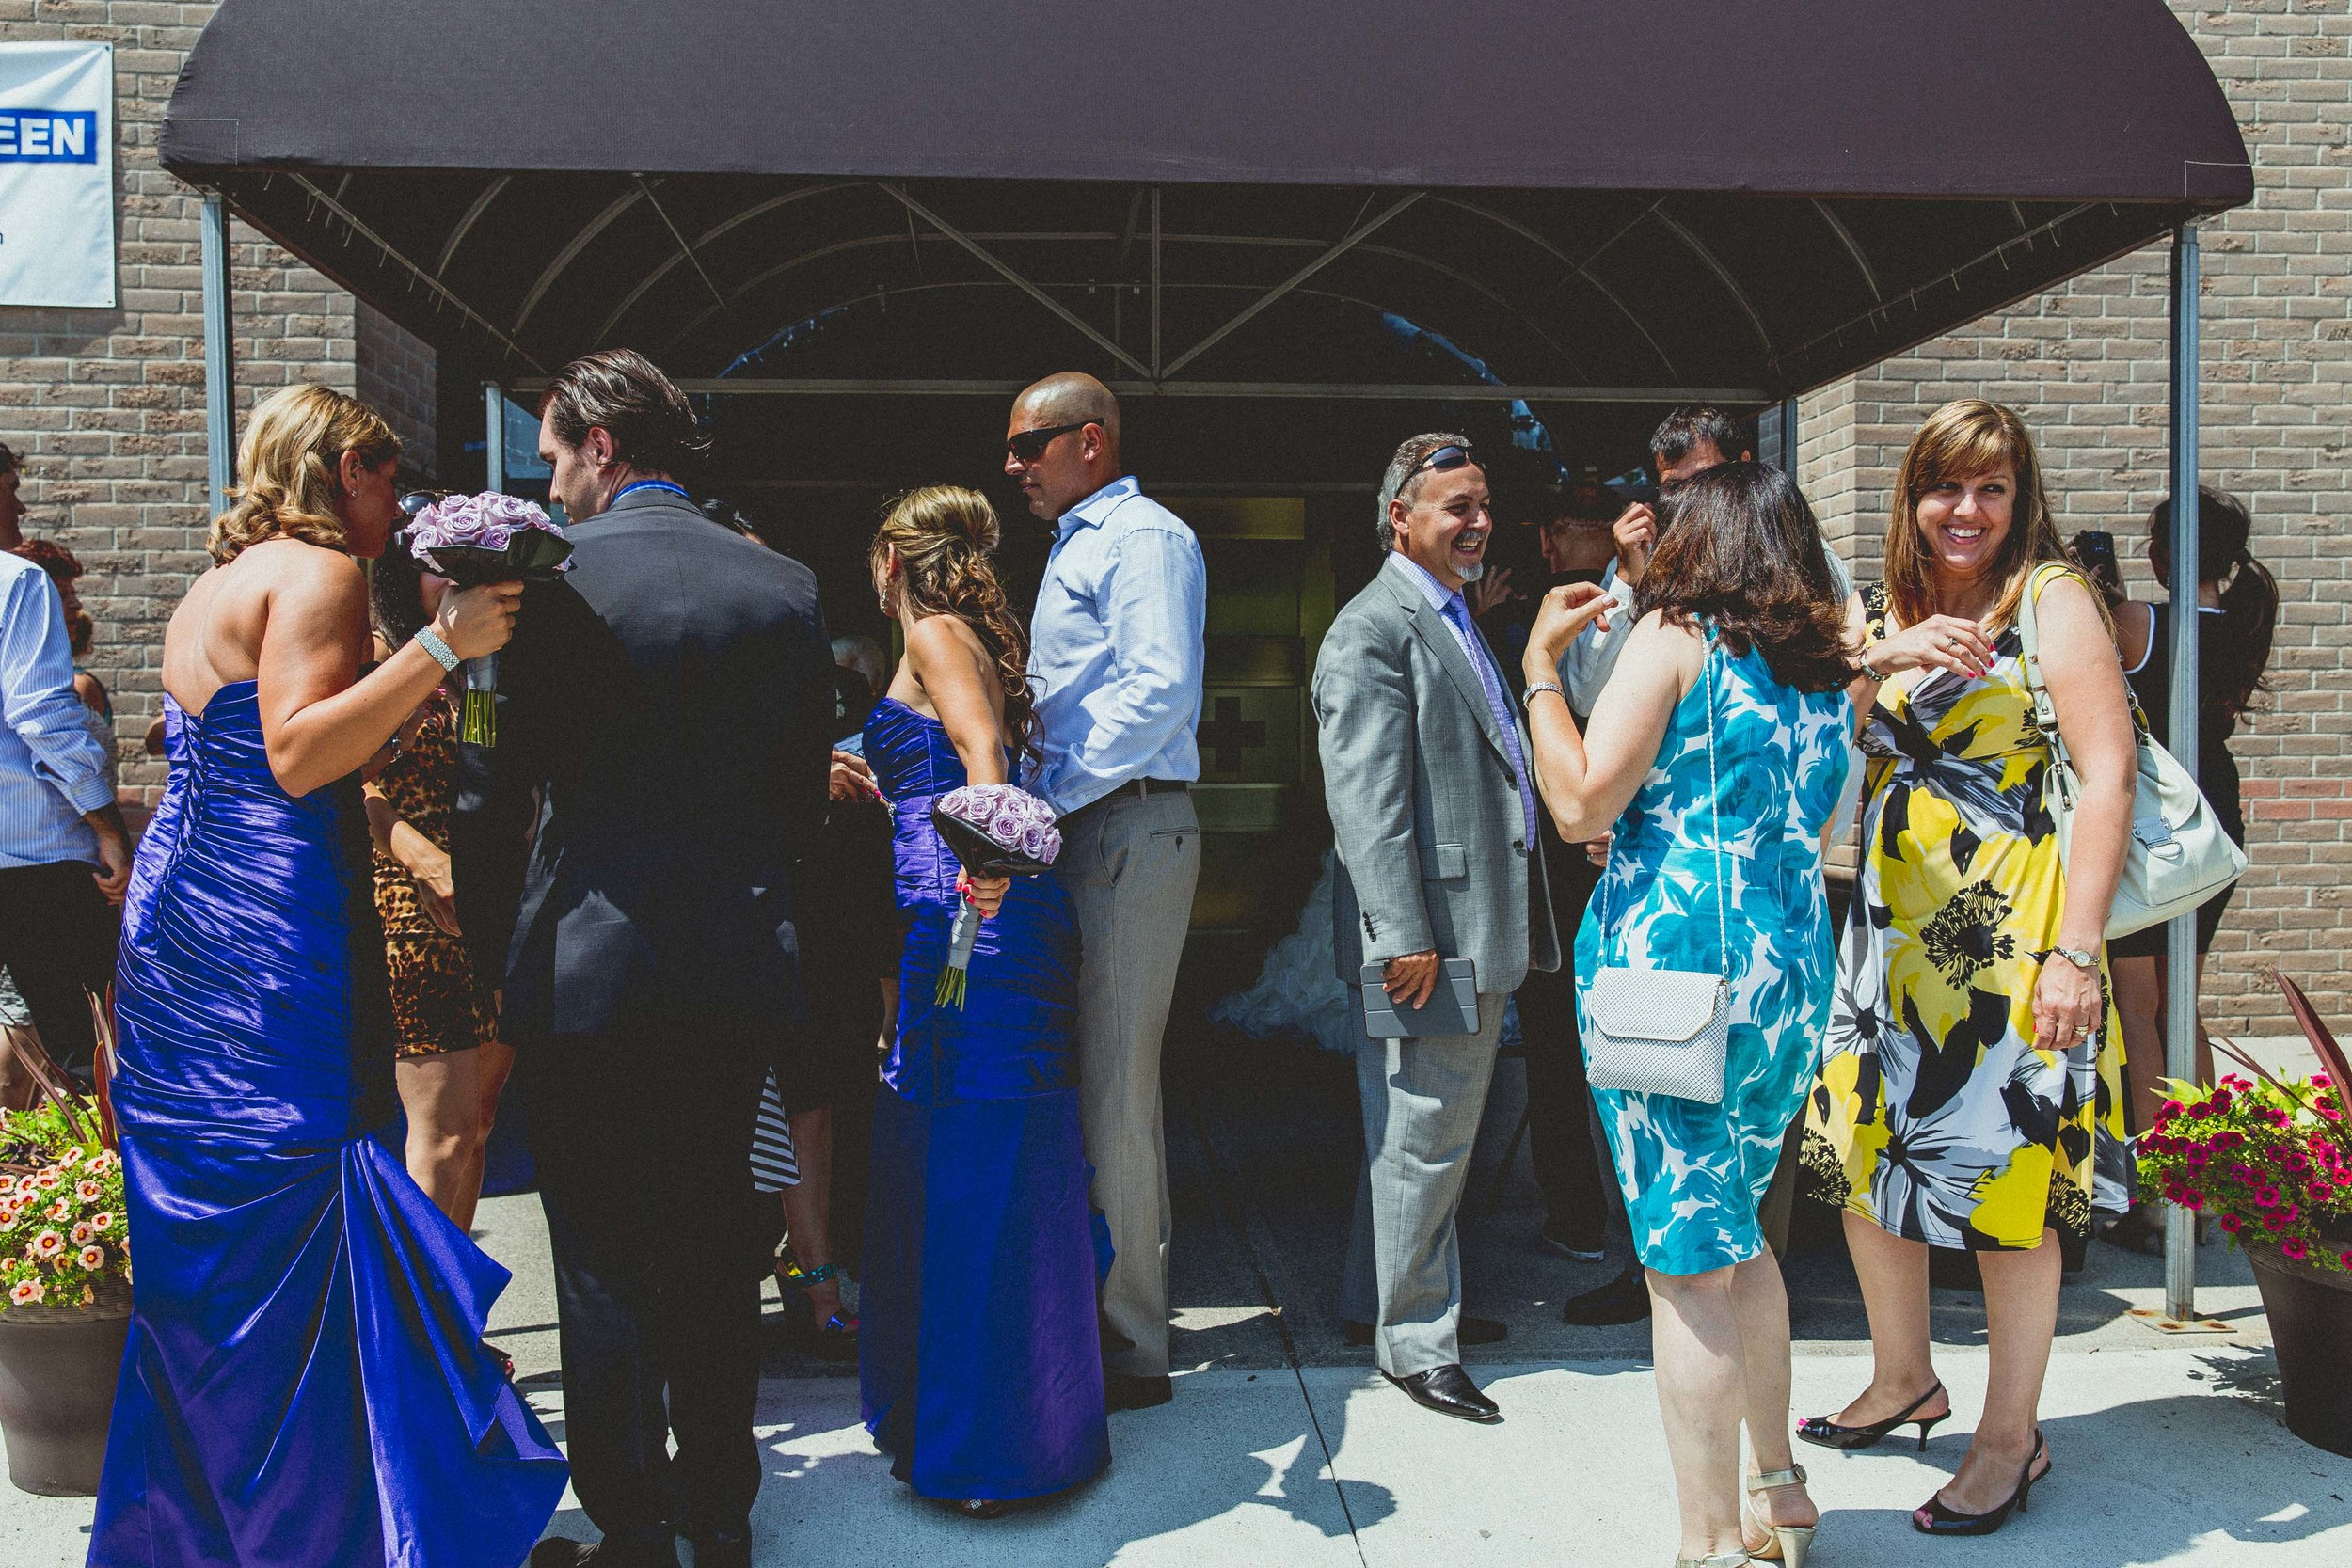 Toronto Wedding Photography | Caterina & Elvis, Pickering catholic wedding (38 of 39).jpg